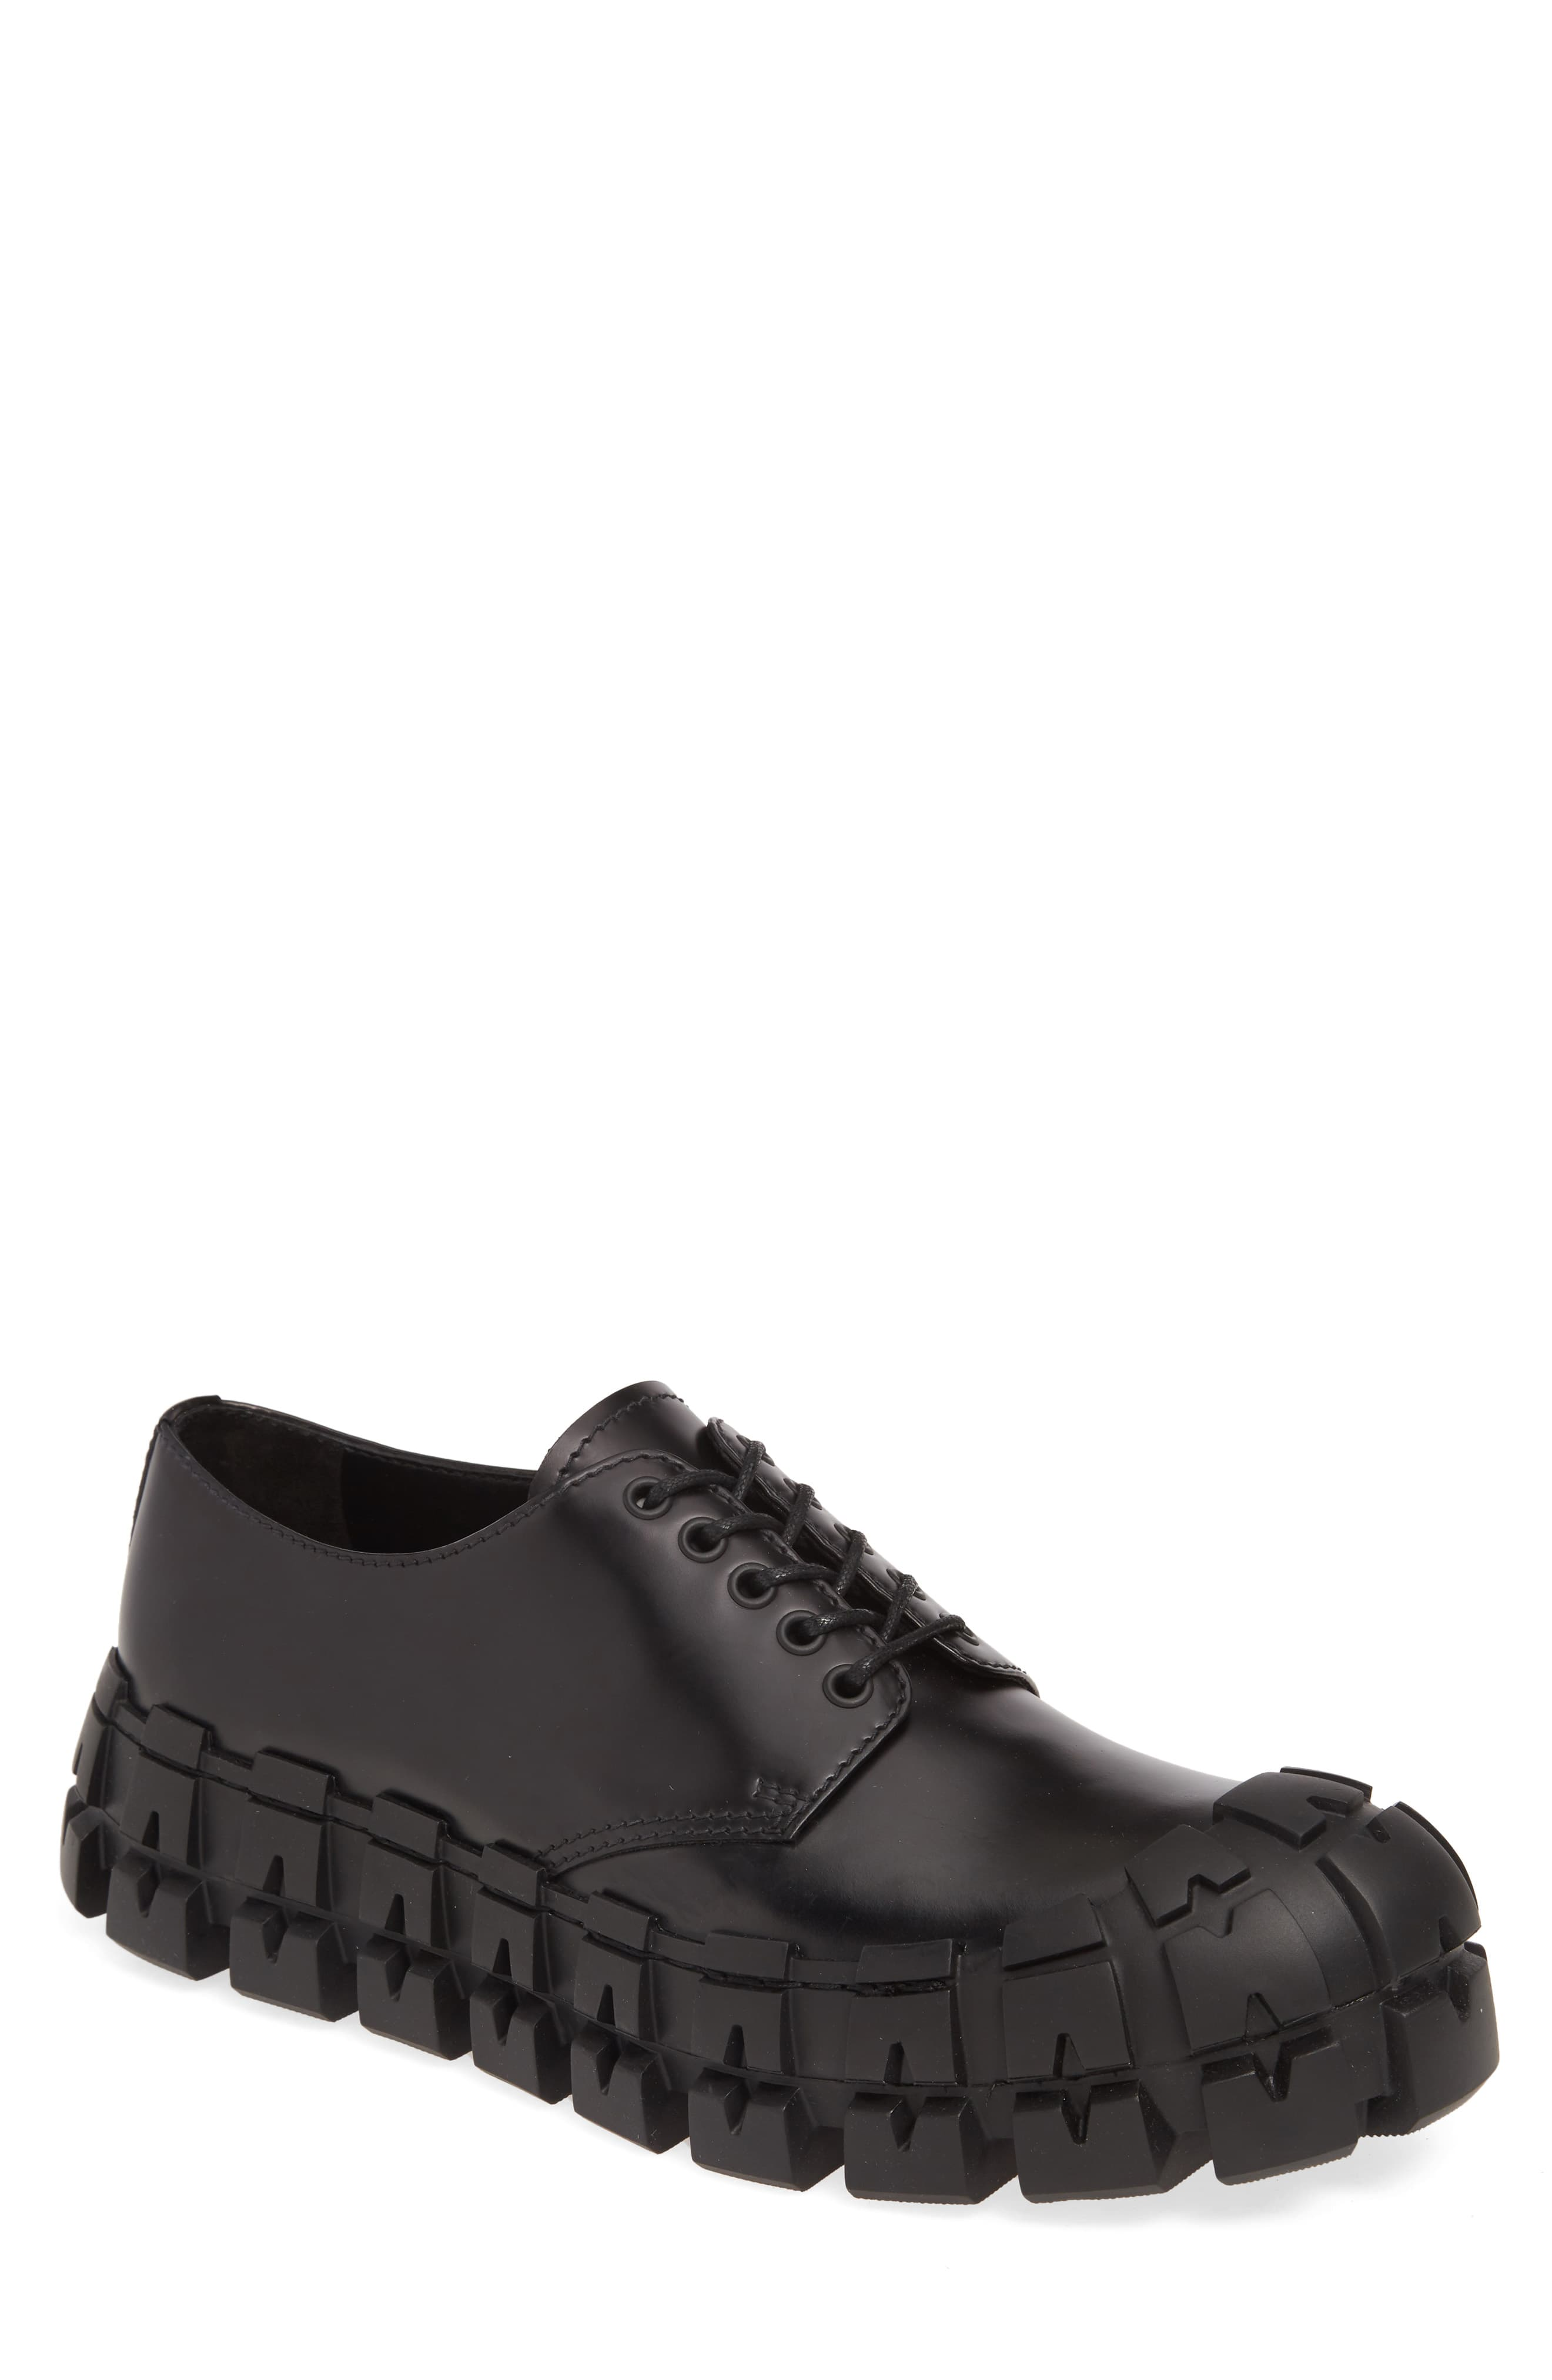 59f9d76a Men's Prada Lug Sole Derby, Size 8US / 7UK - Black